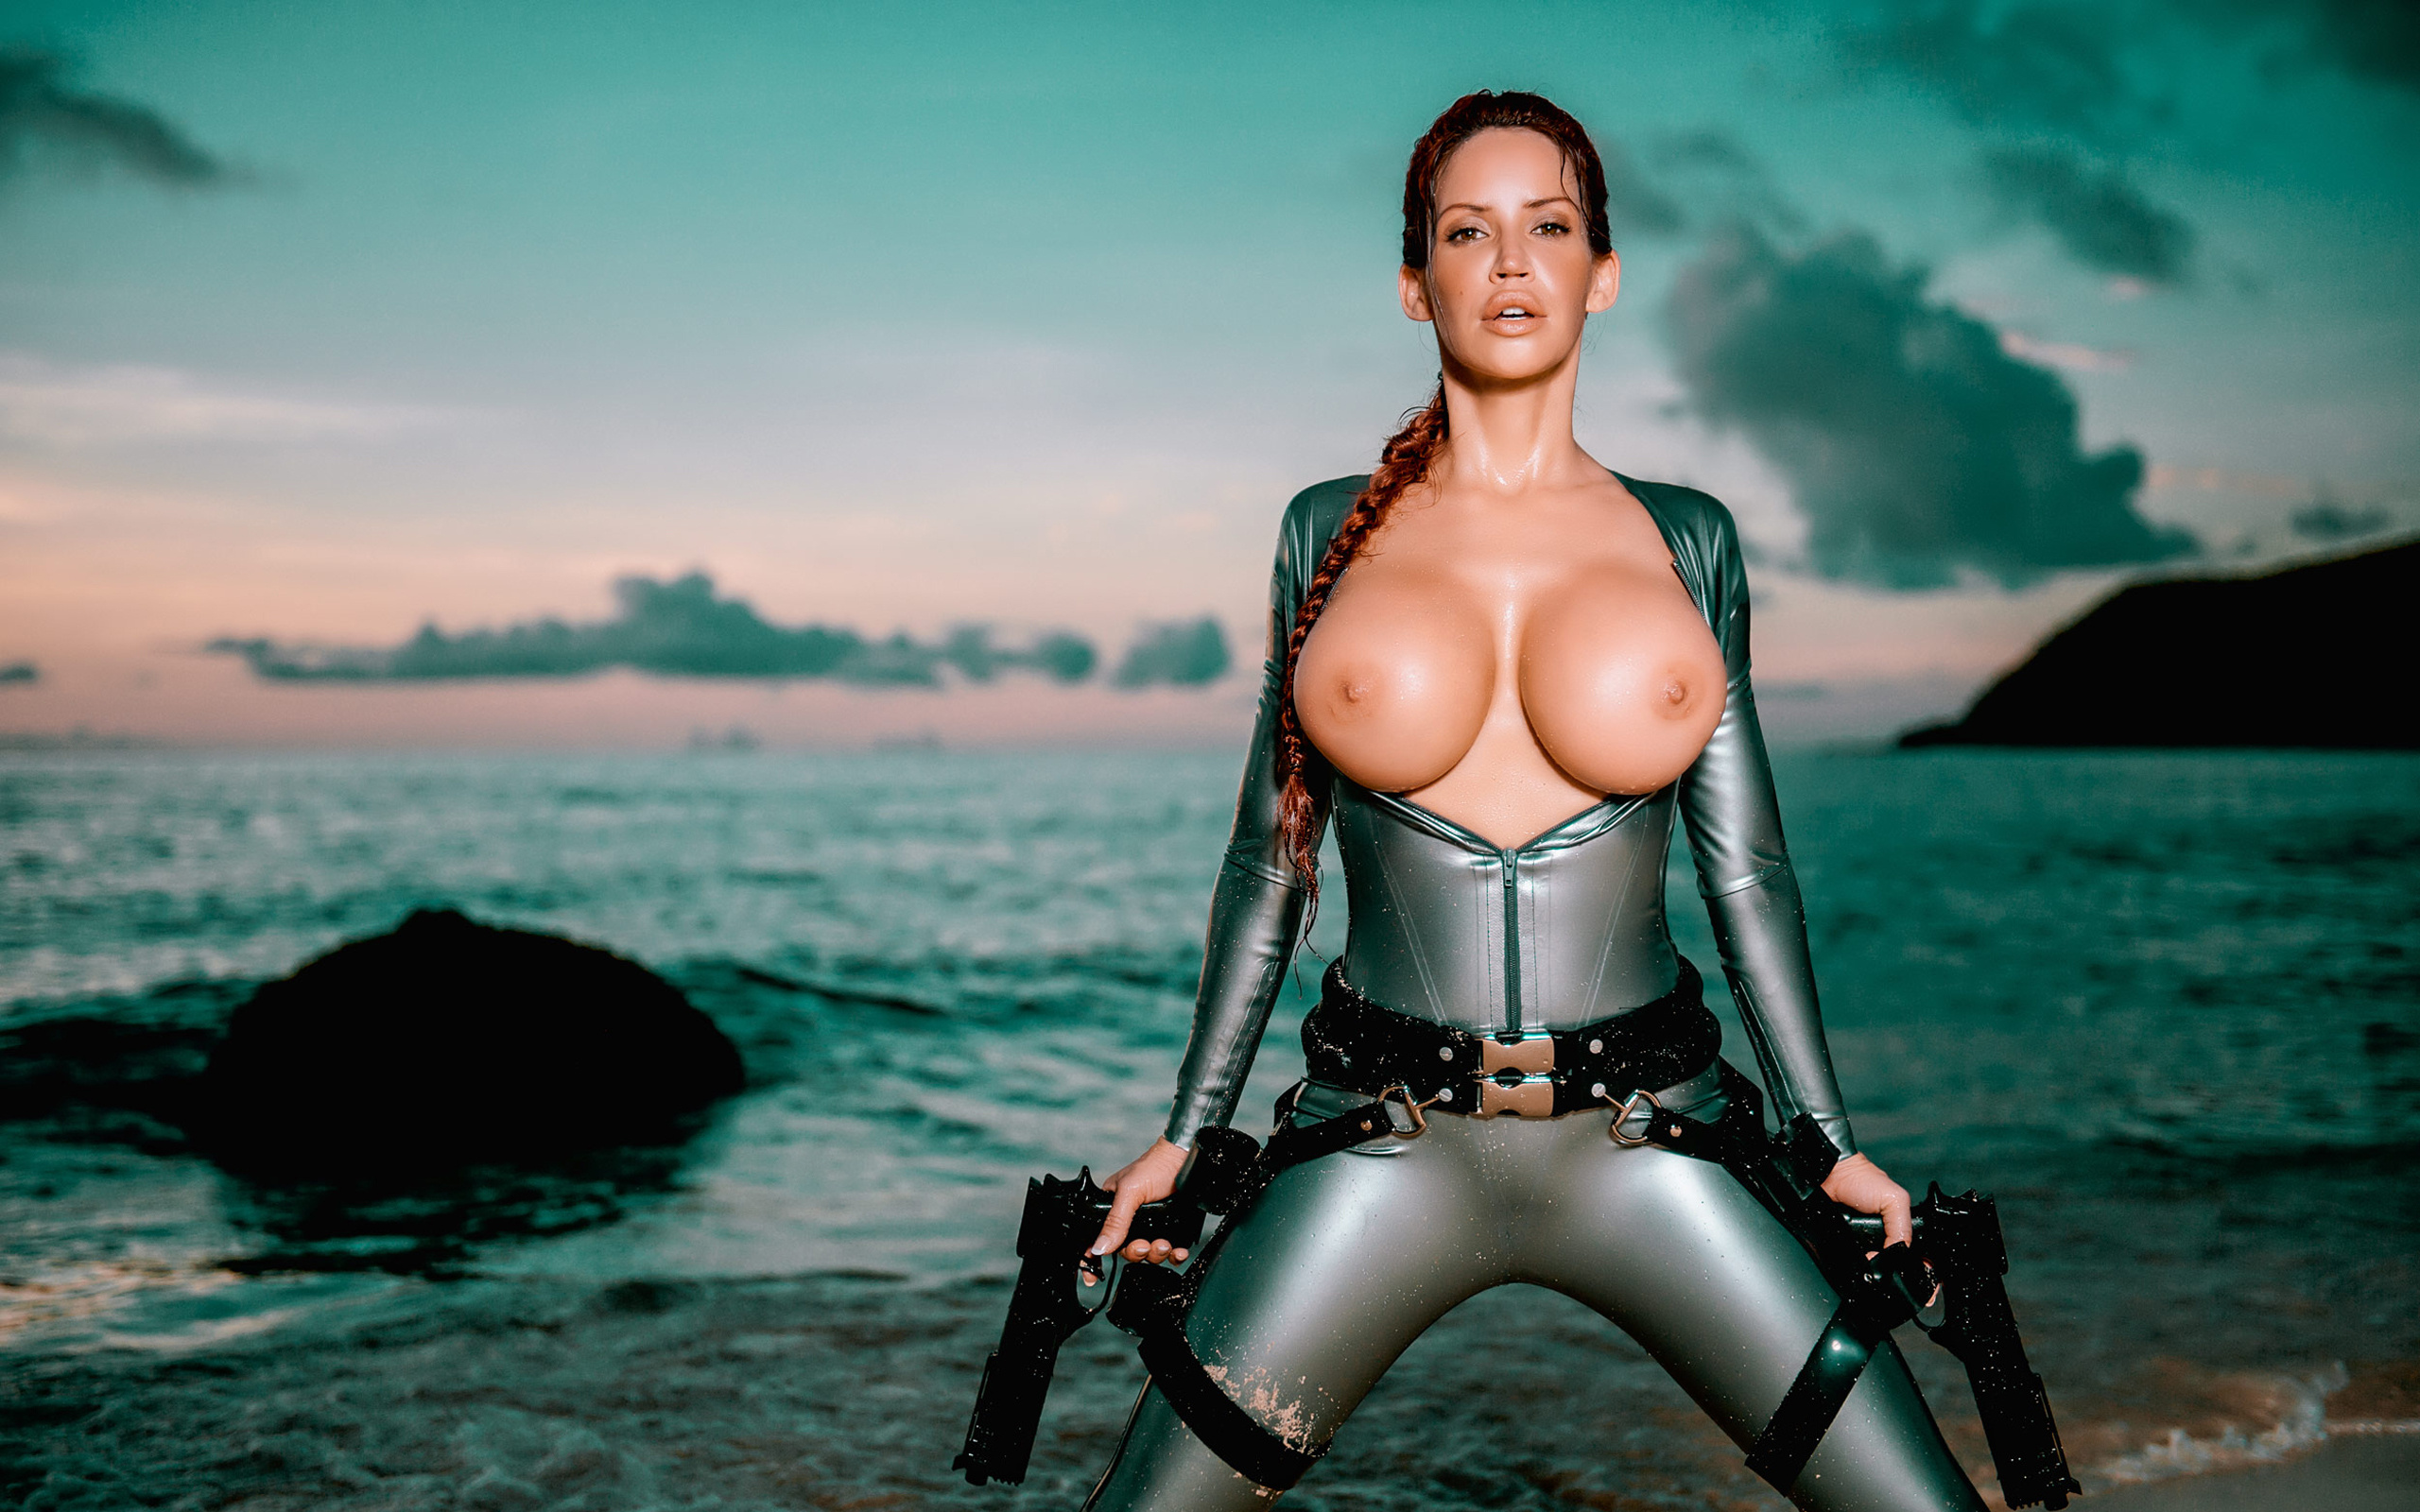 Sexy hot big boobed lara croft nude nackt image